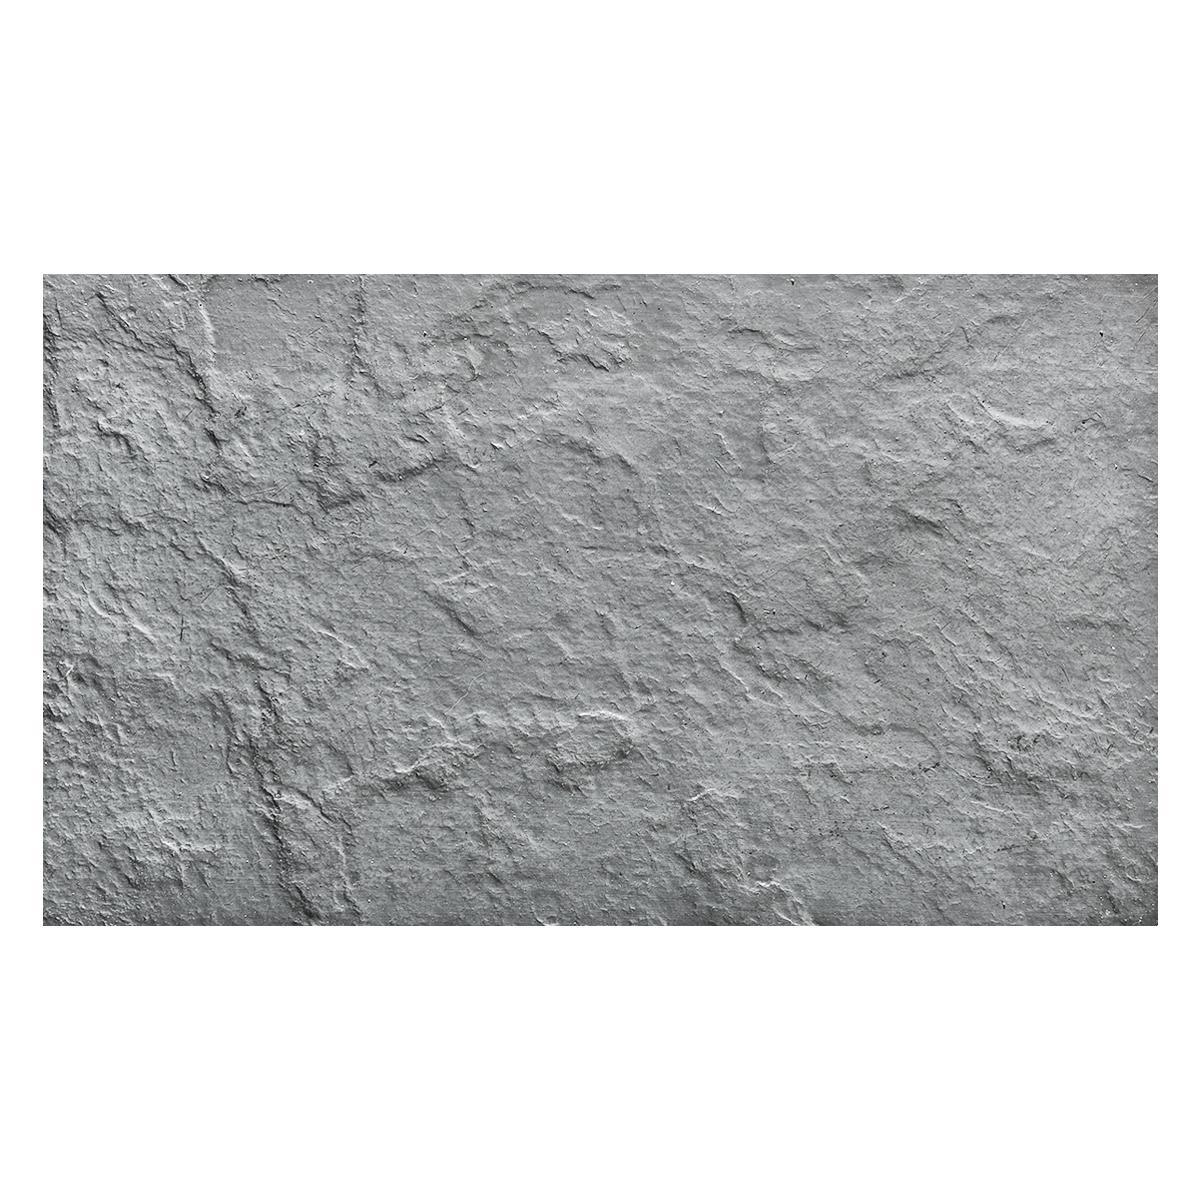 Piso De Concreto Laja Cordillera Gris - 30X50 cm - 0.3 m2